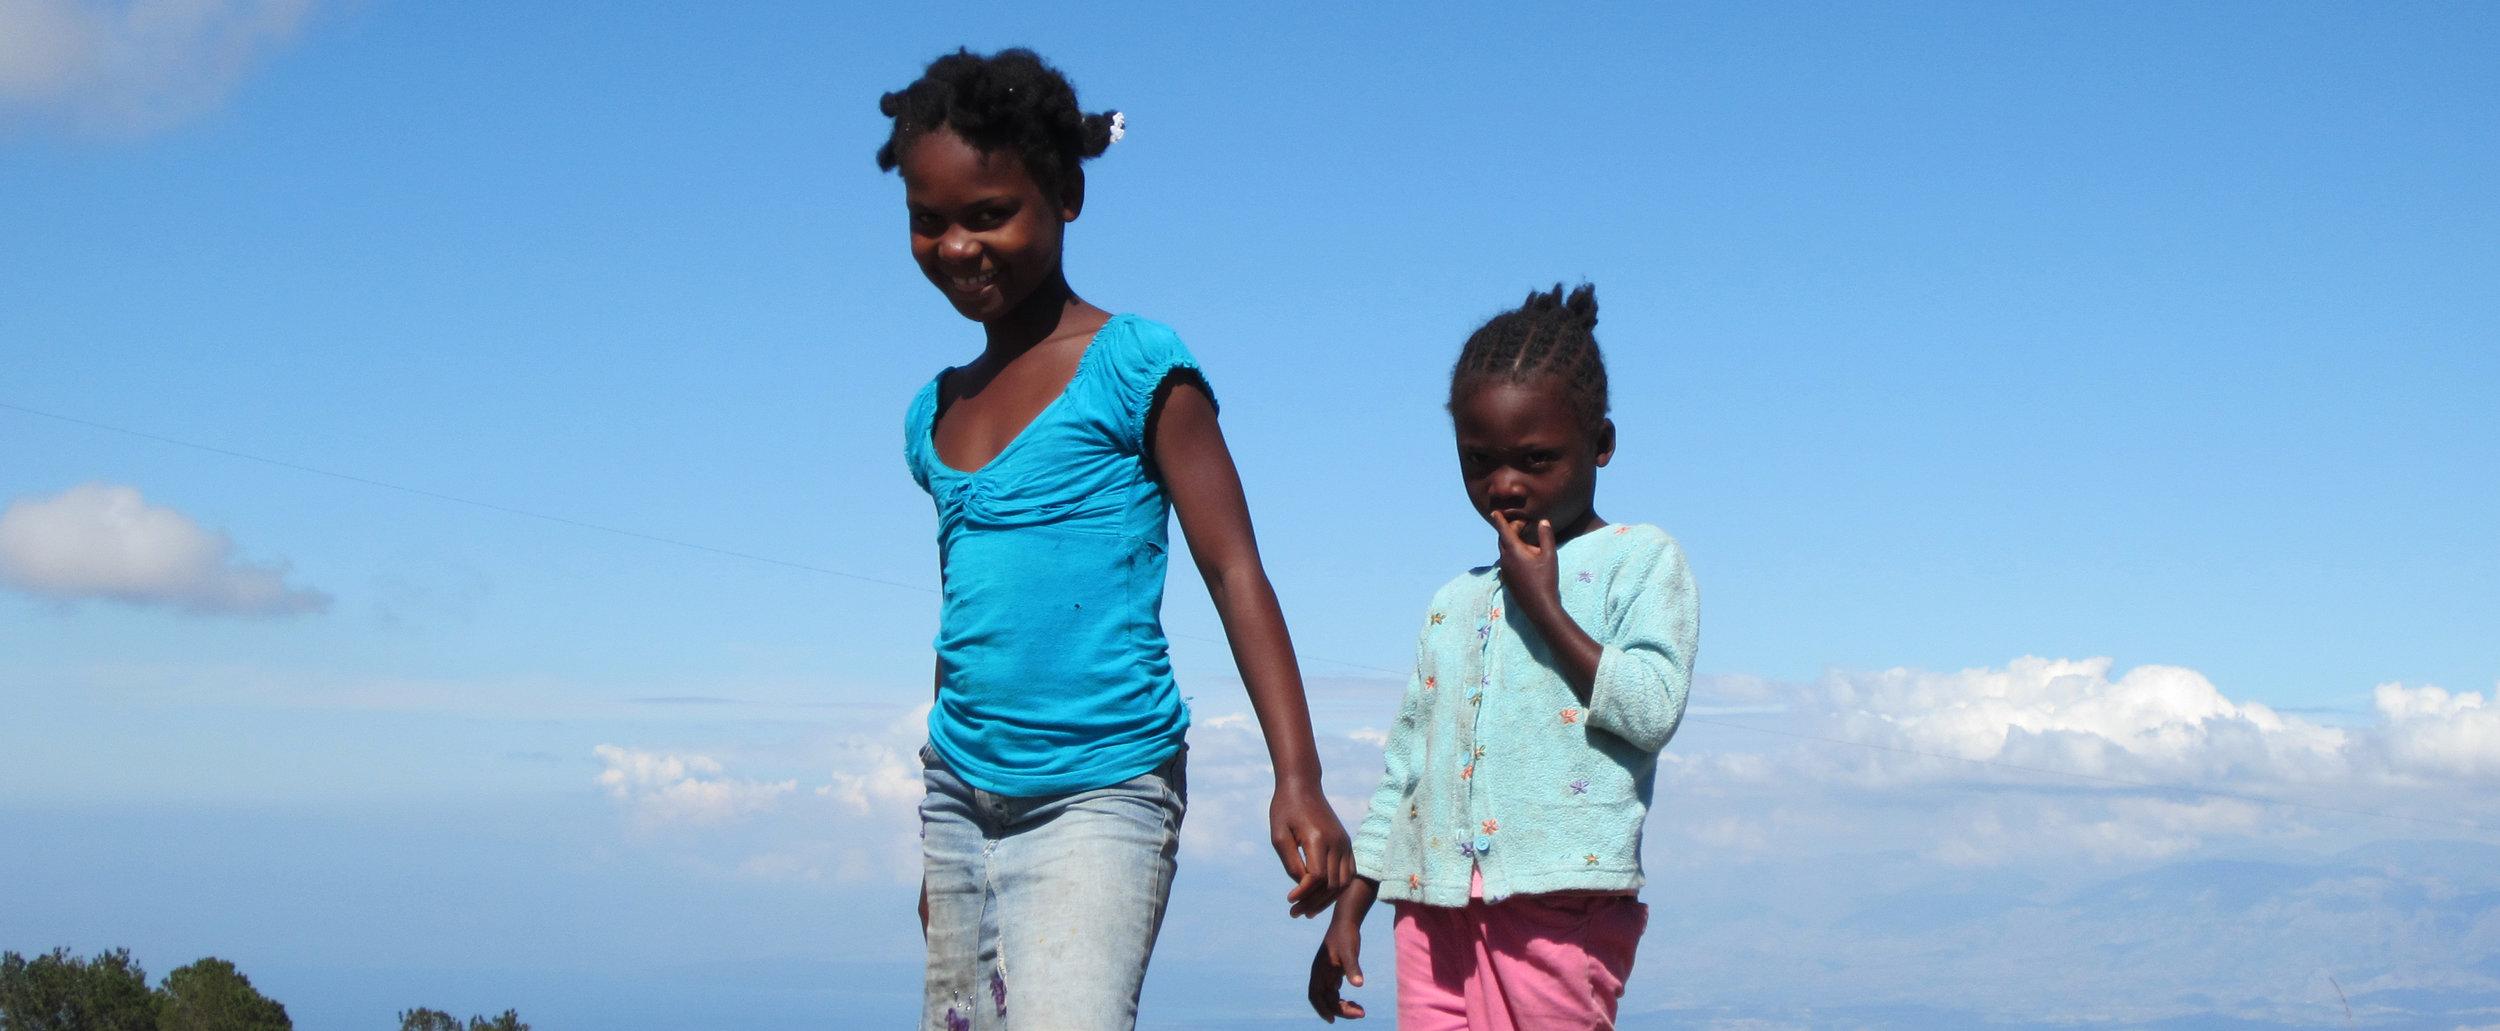 Girls playing near Port-au-Prince, Haiti